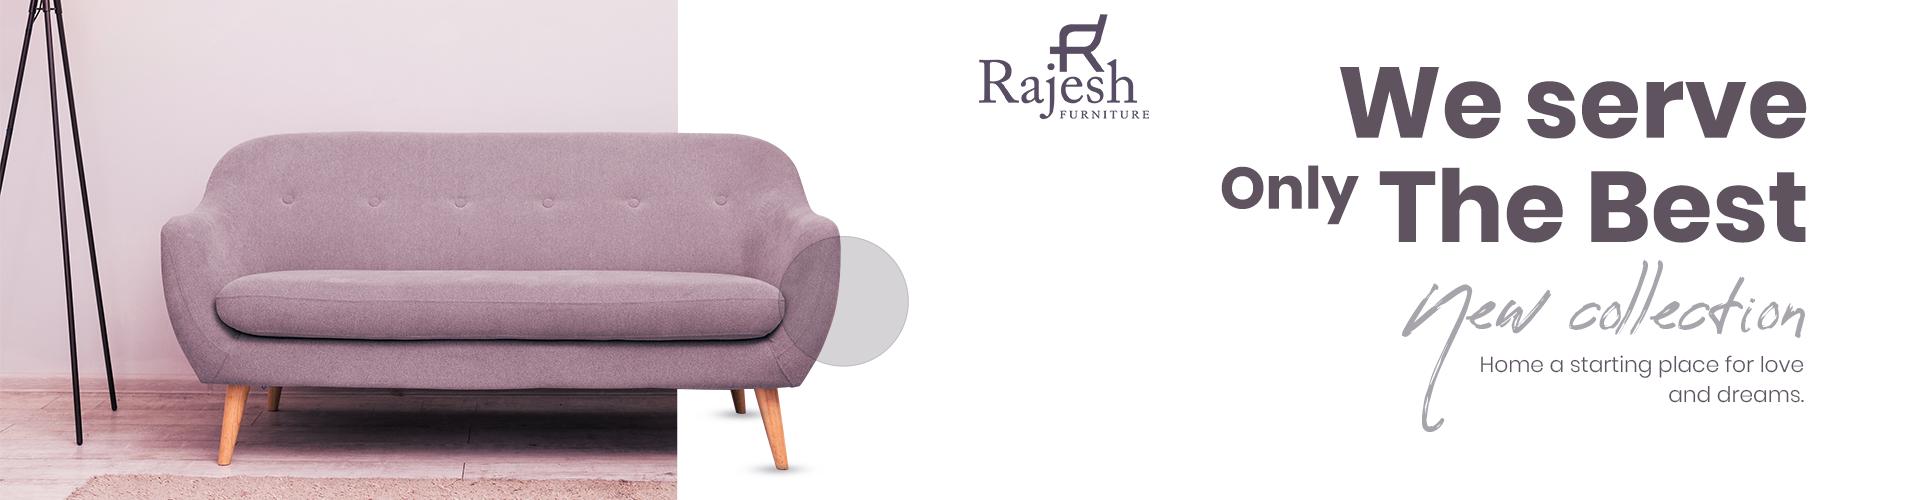 Rajesh-furniture-banner_sofo-1920_500-2